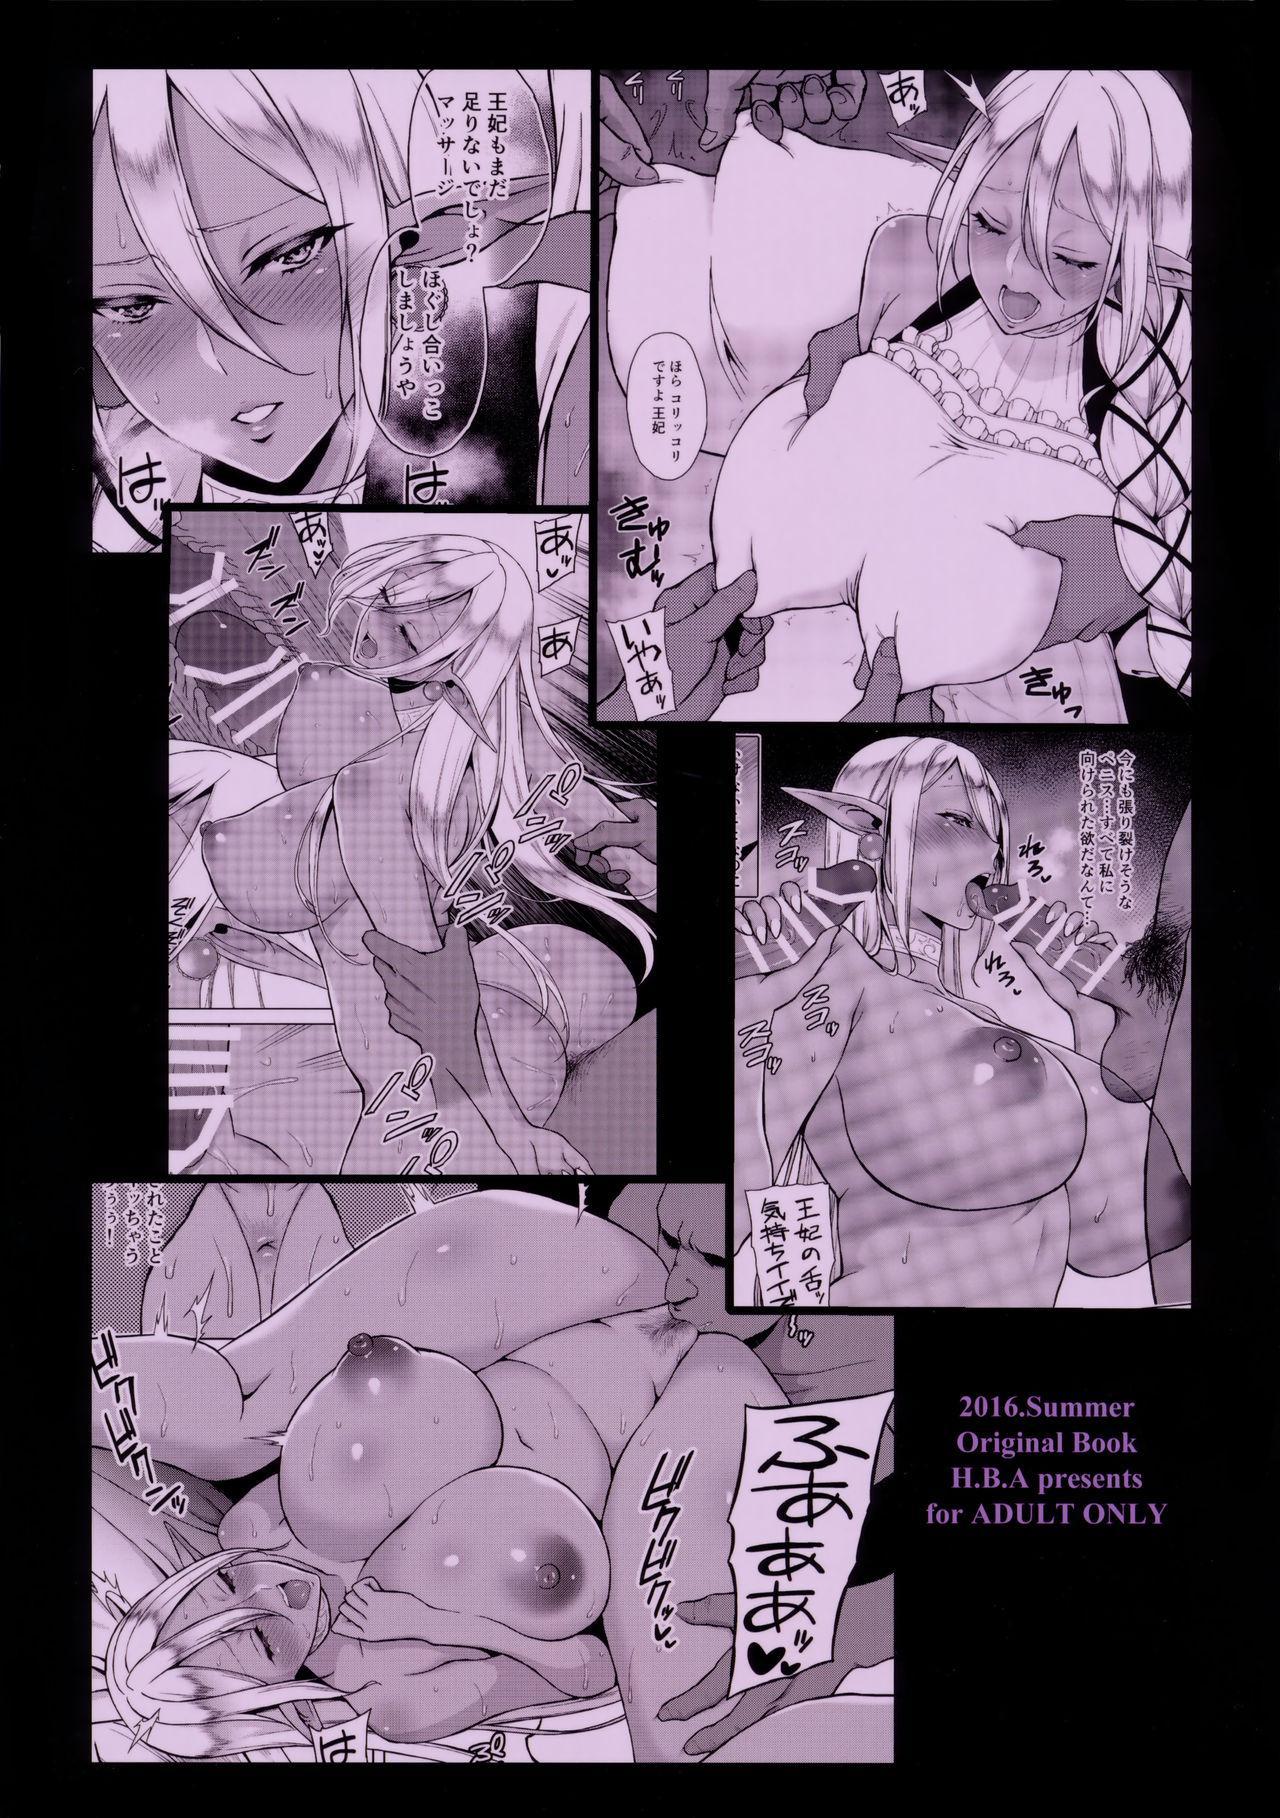 (C90) [H.B.A (Usagi Nagomu)] Inka -Nikuyoku ni Aragaenai Karada- + C90 Kaijou Genteibon 25